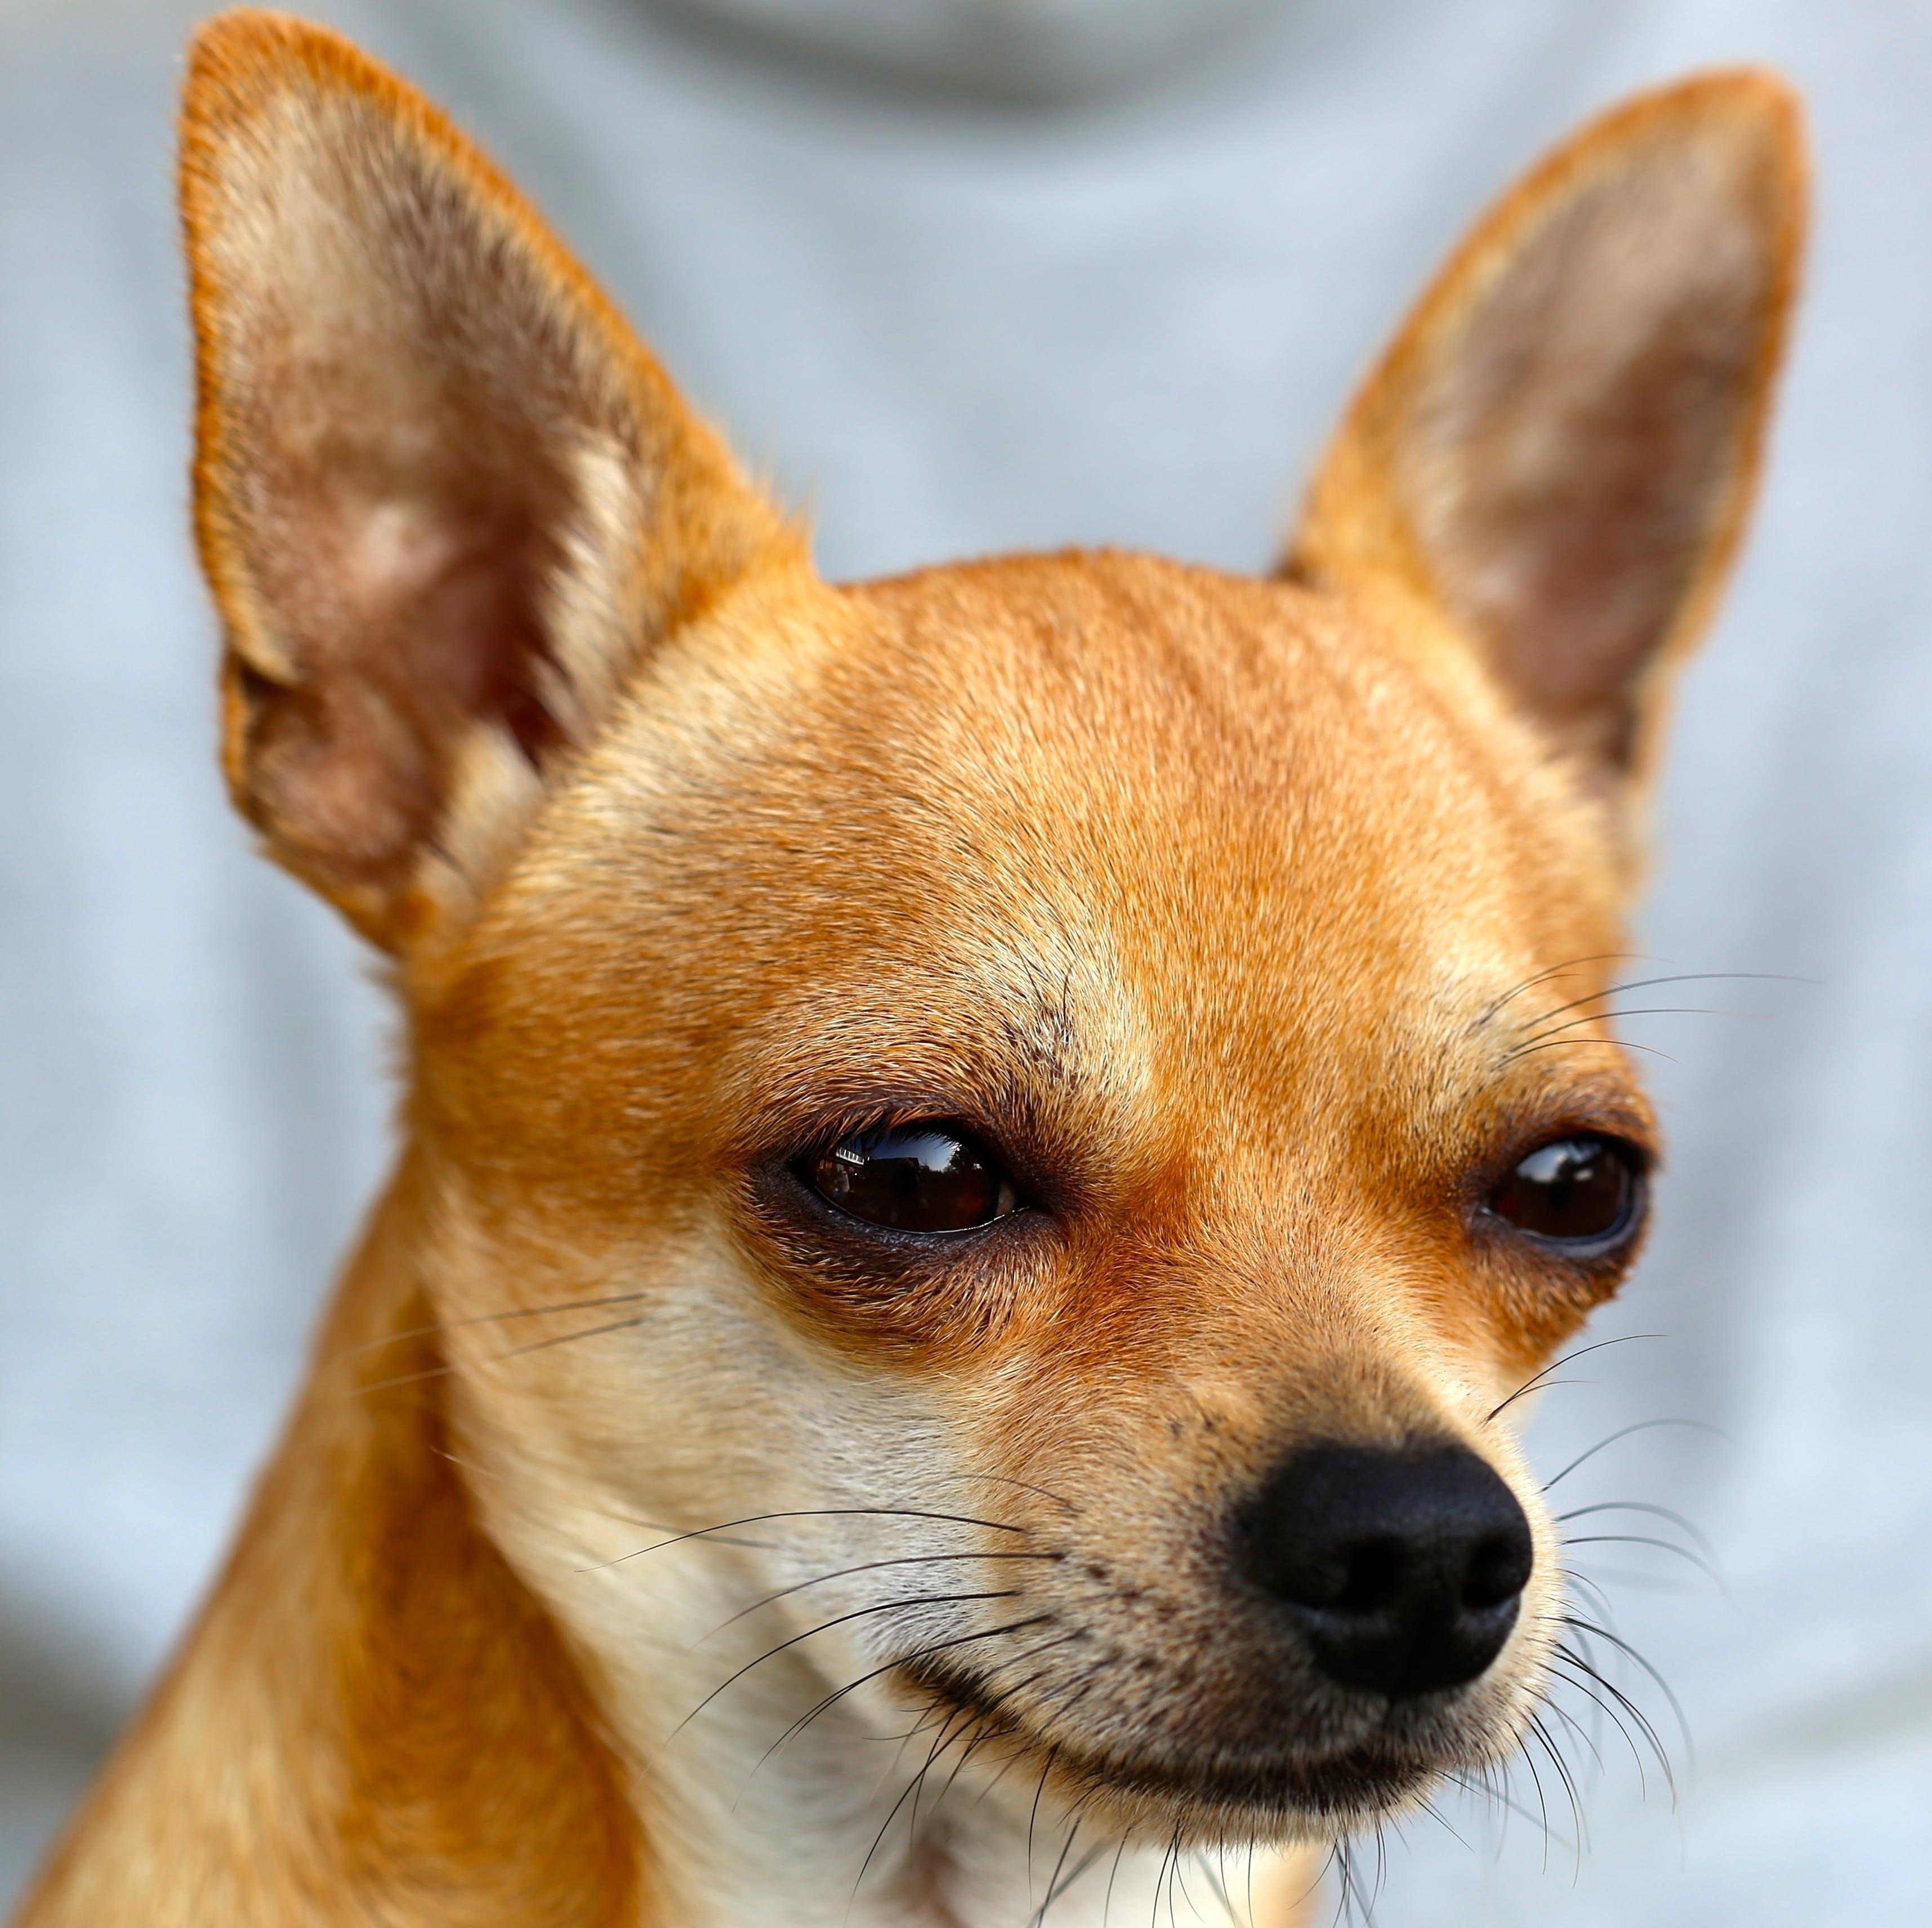 Gratis lagerfoto af chihuahua, close-up, dyr, hund